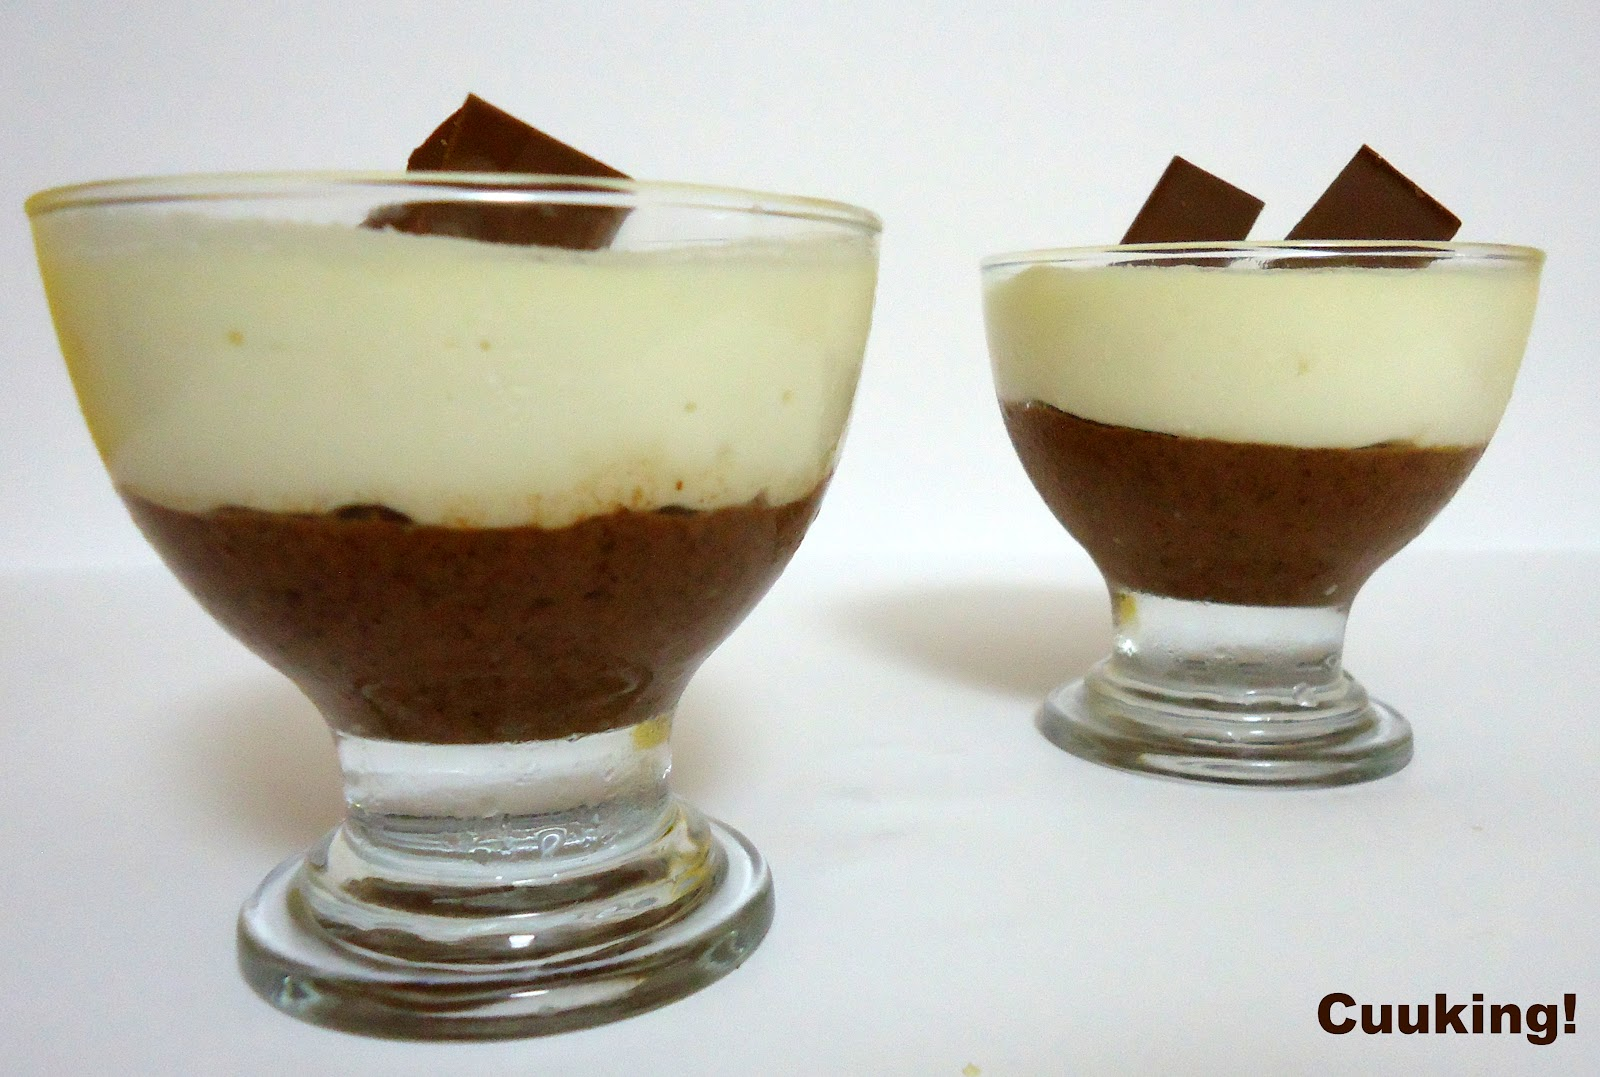 Copa mousse dos chocolates